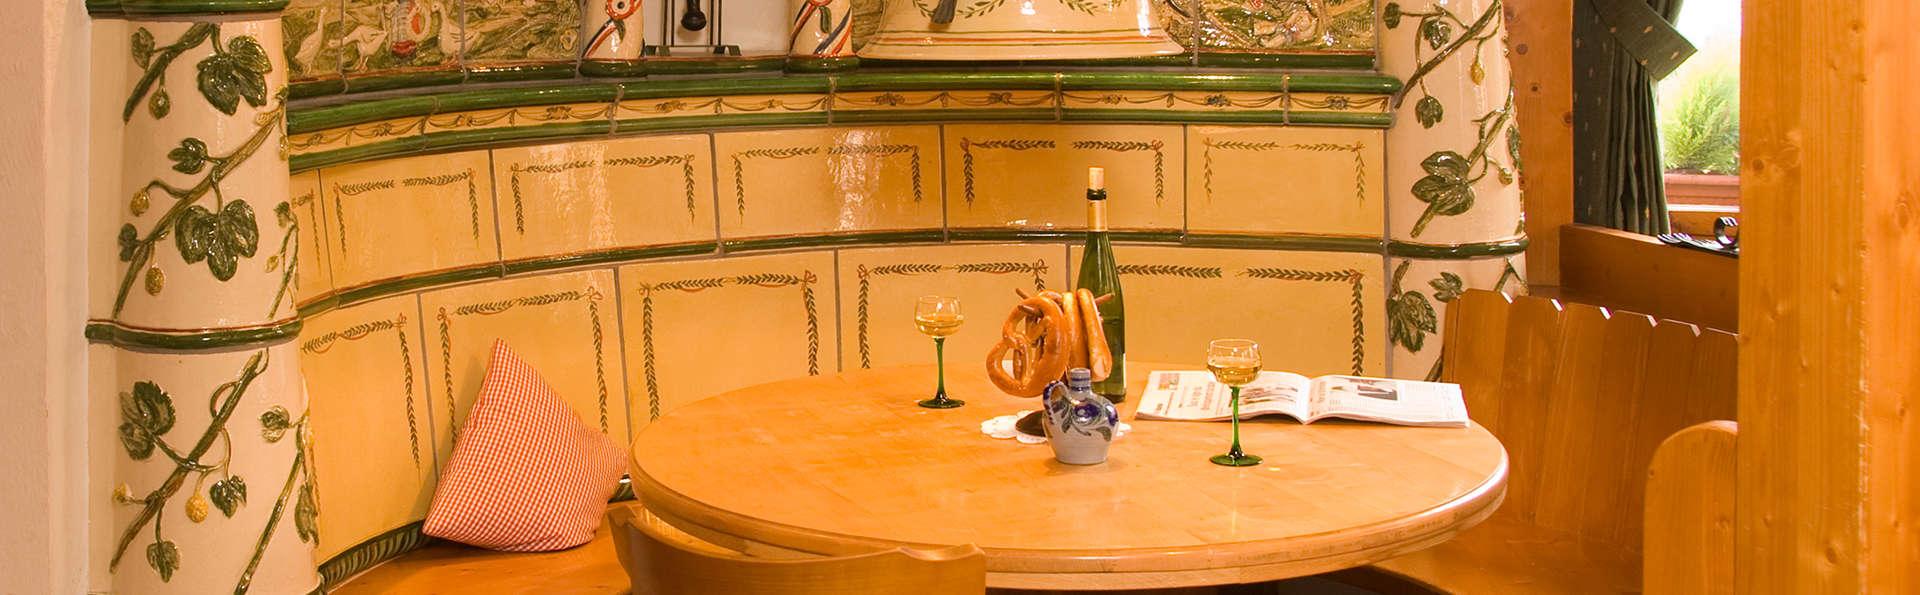 Hôtel du Parc Spa & Wellness - Niederbronn - EDIT_aperitive.jpg